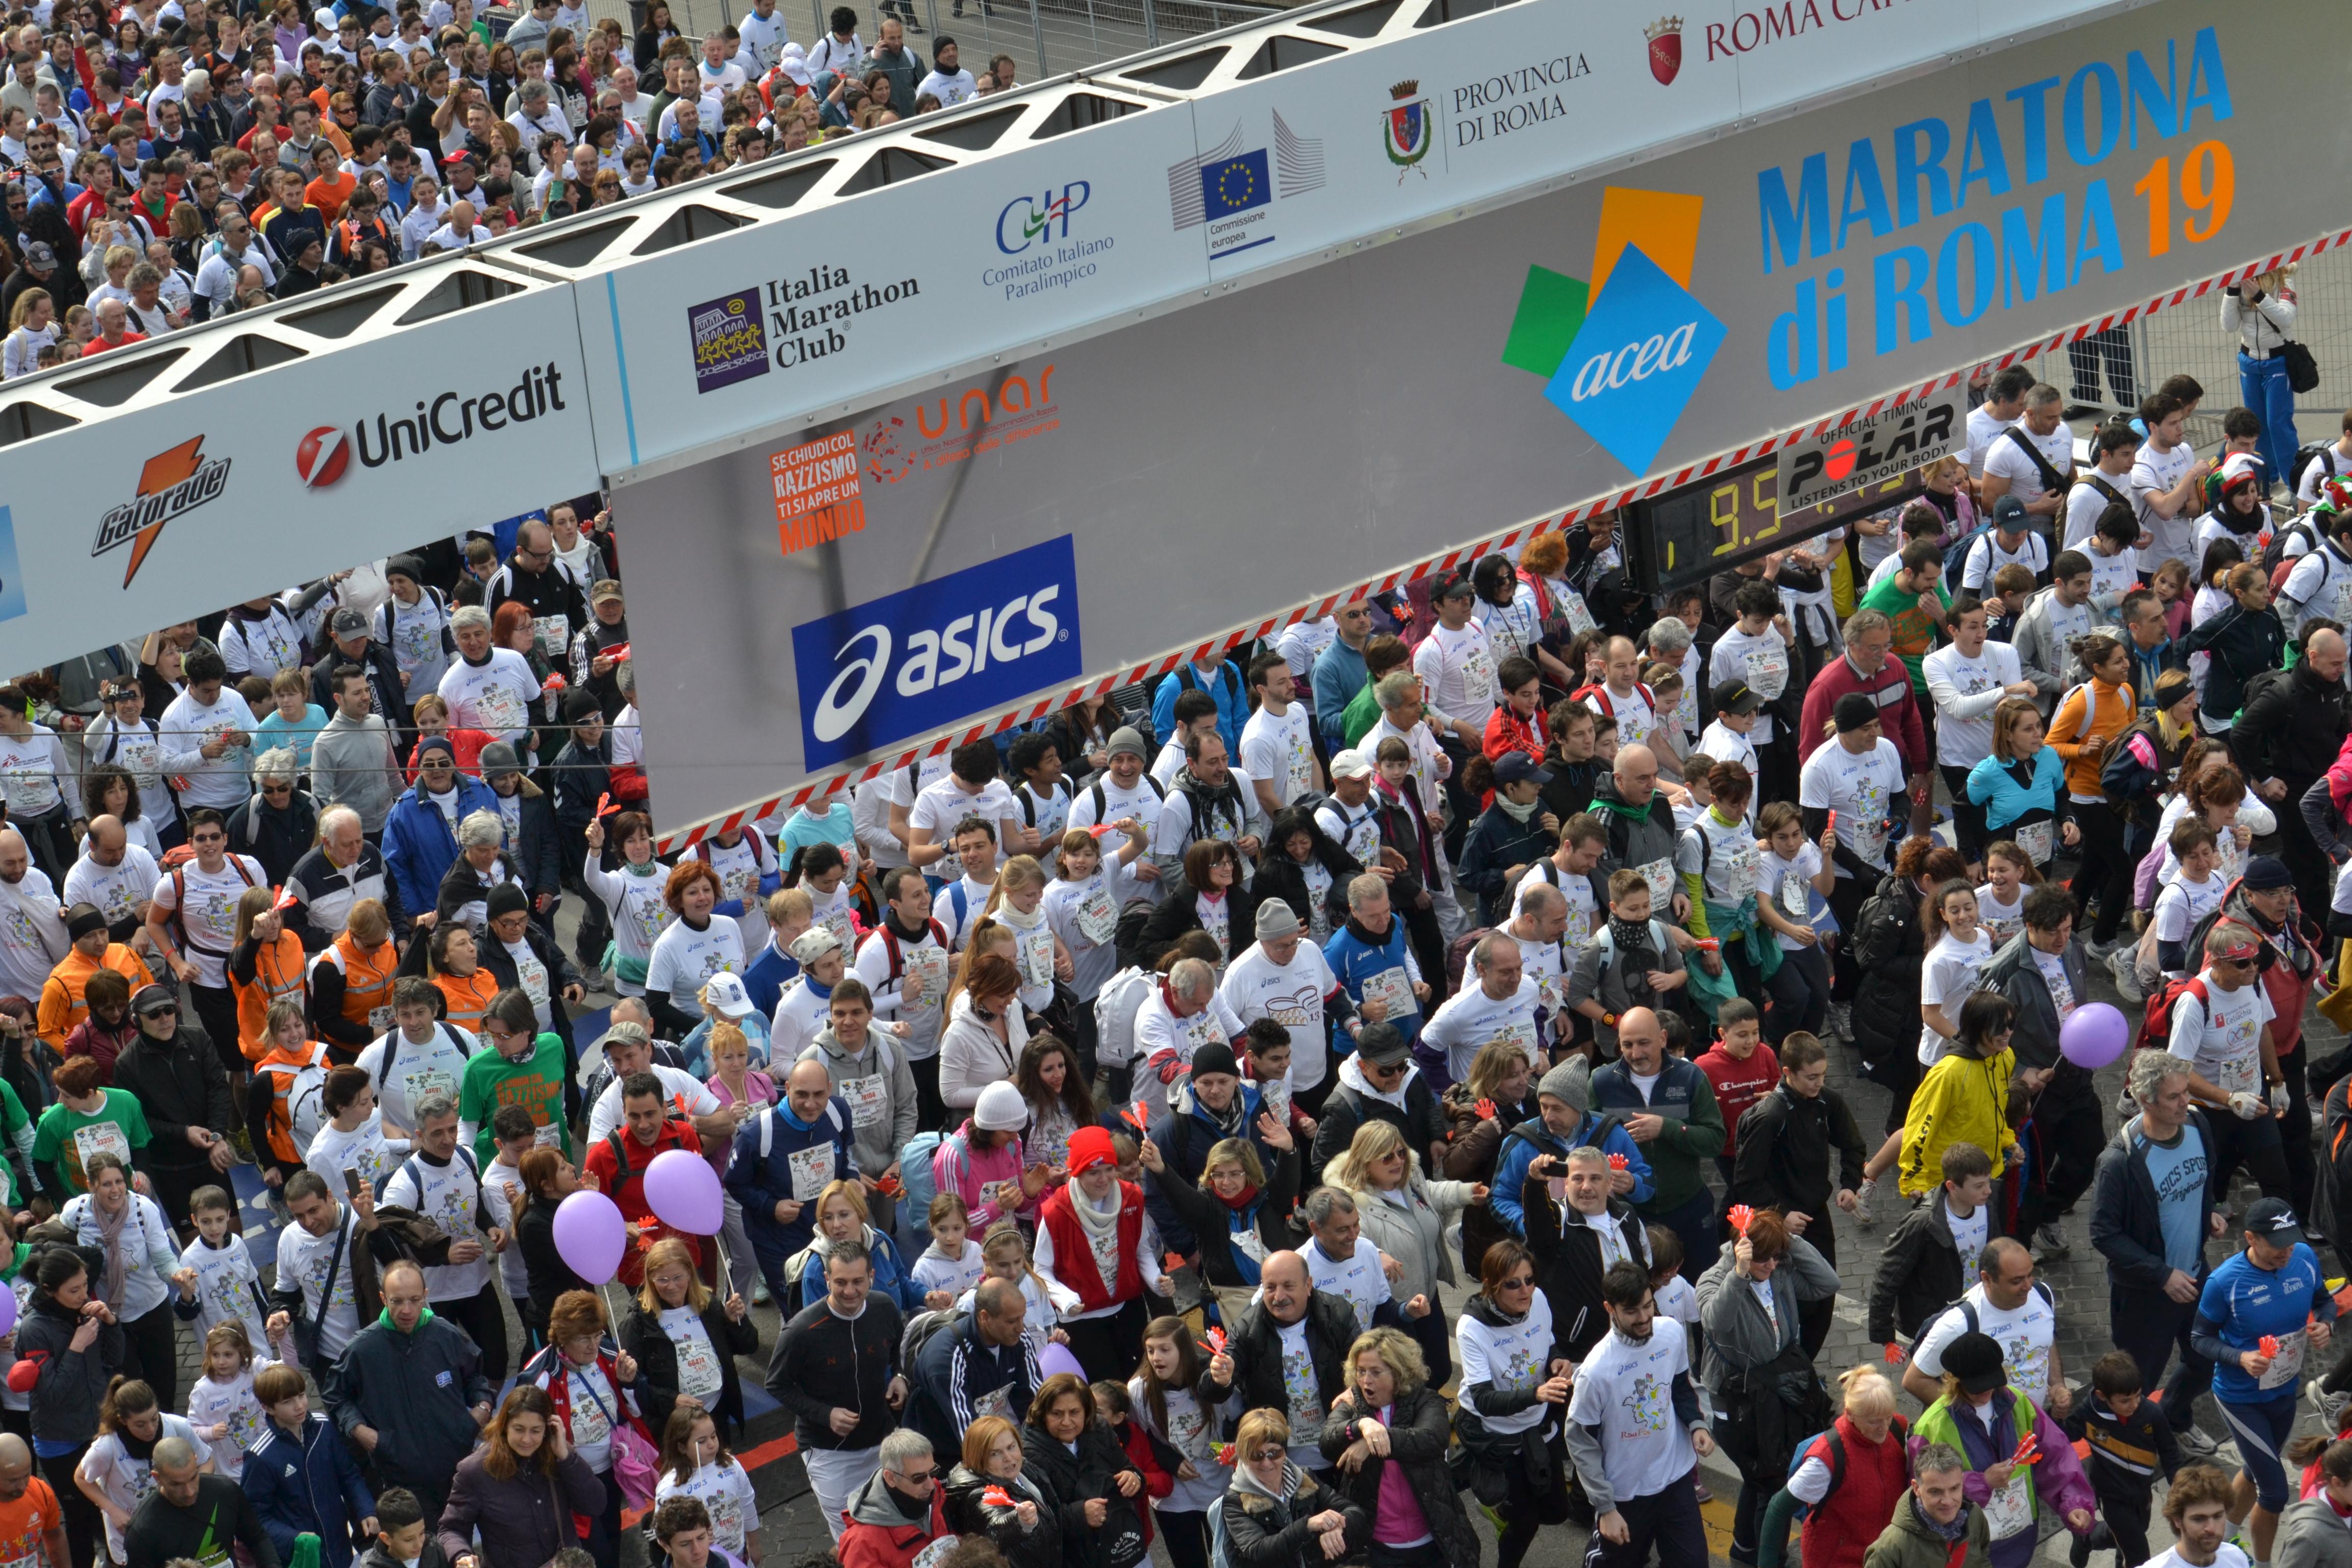 maratona-di-roma-2013-415